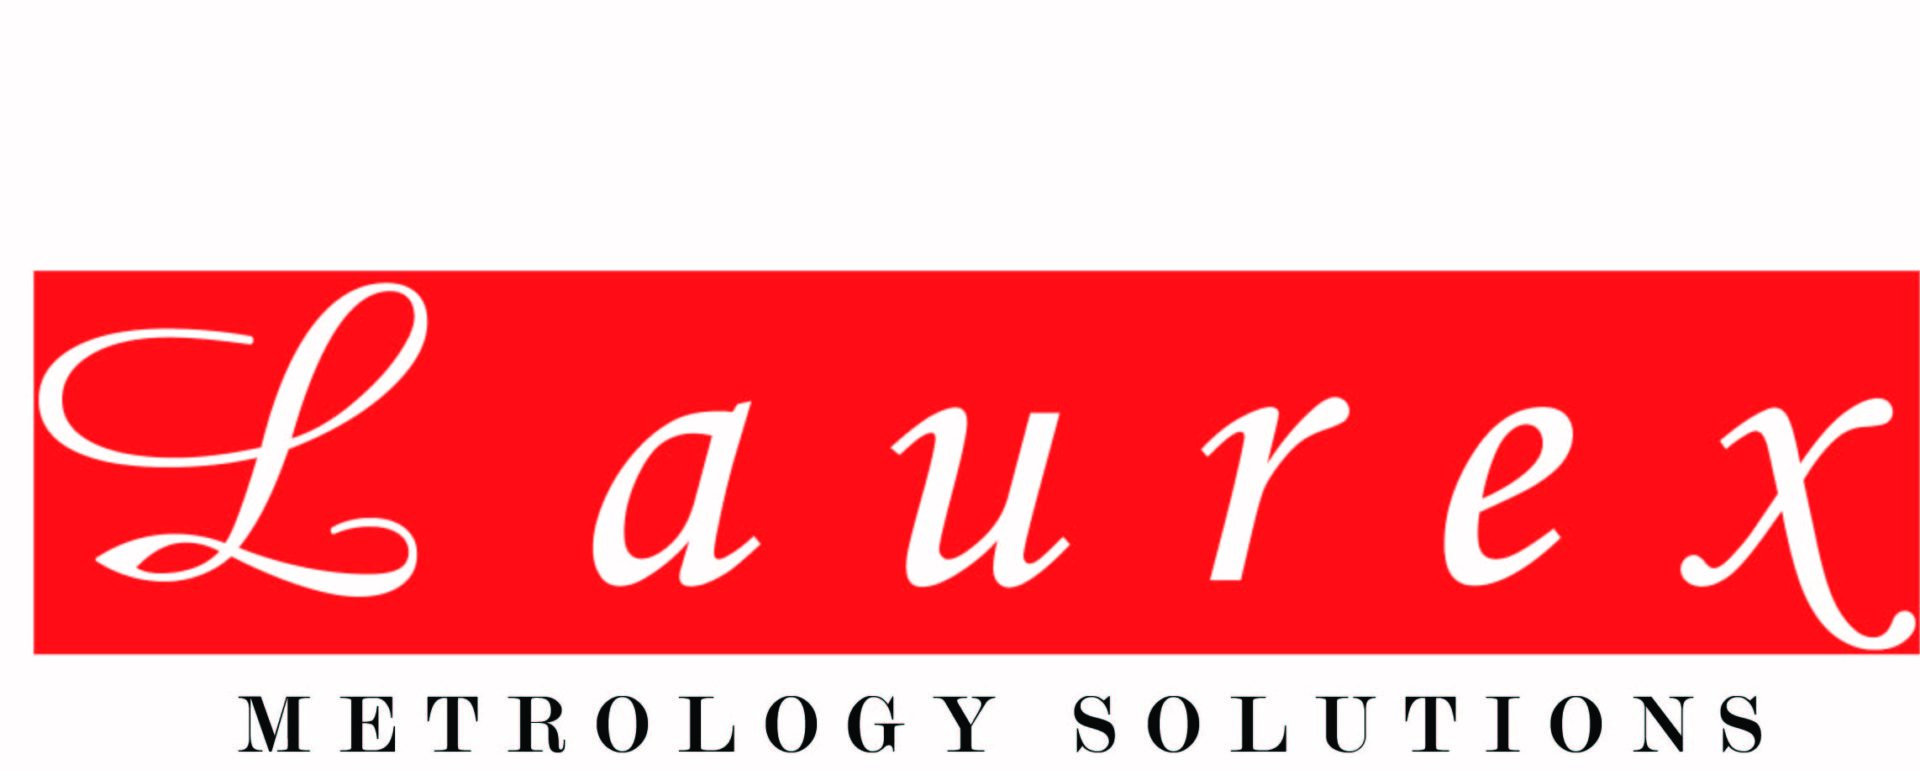 930, 930, laurex logo2, laurex-logo2.jpg, 113707, https://starrett-metrology.co.uk/wp-content/uploads/2020/02/laurex-logo2.jpg, https://starrett-metrology.co.uk/distributor/laurex-logo2/, , 4, , , laurex-logo2, inherit, 261, 2020-02-28 14:30:32, 2020-02-28 14:30:32, 0, image/jpeg, image, jpeg, https://starrett-metrology.co.uk/wp-includes/images/media/default.png, 1920, 770, Array